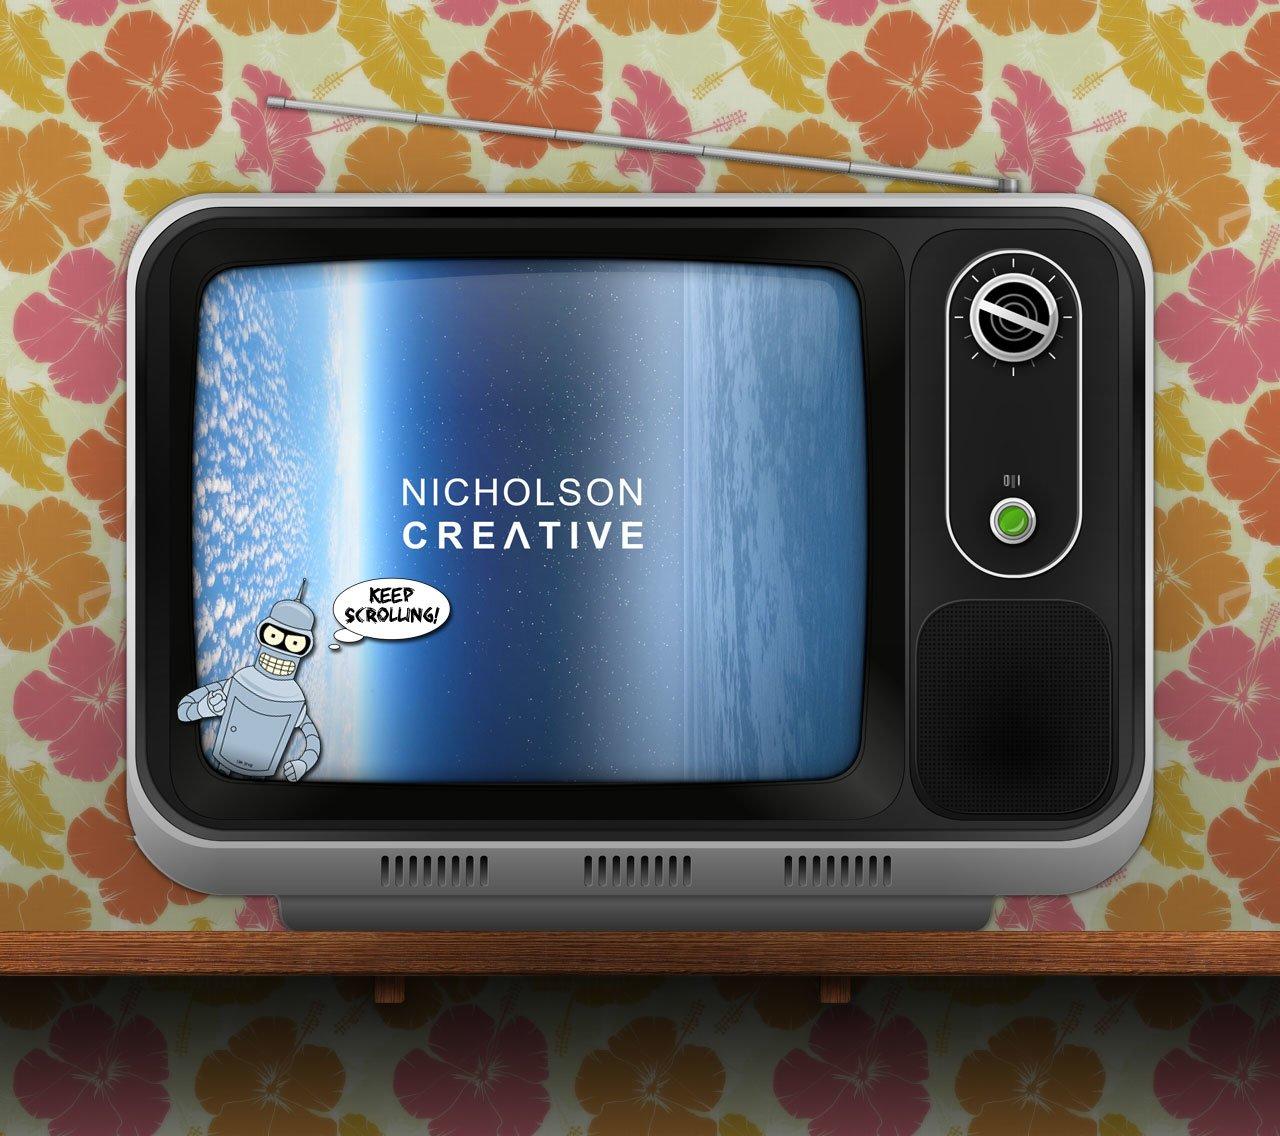 A TV illustrated for a portfolio site © NICHOLSON CREATIVE